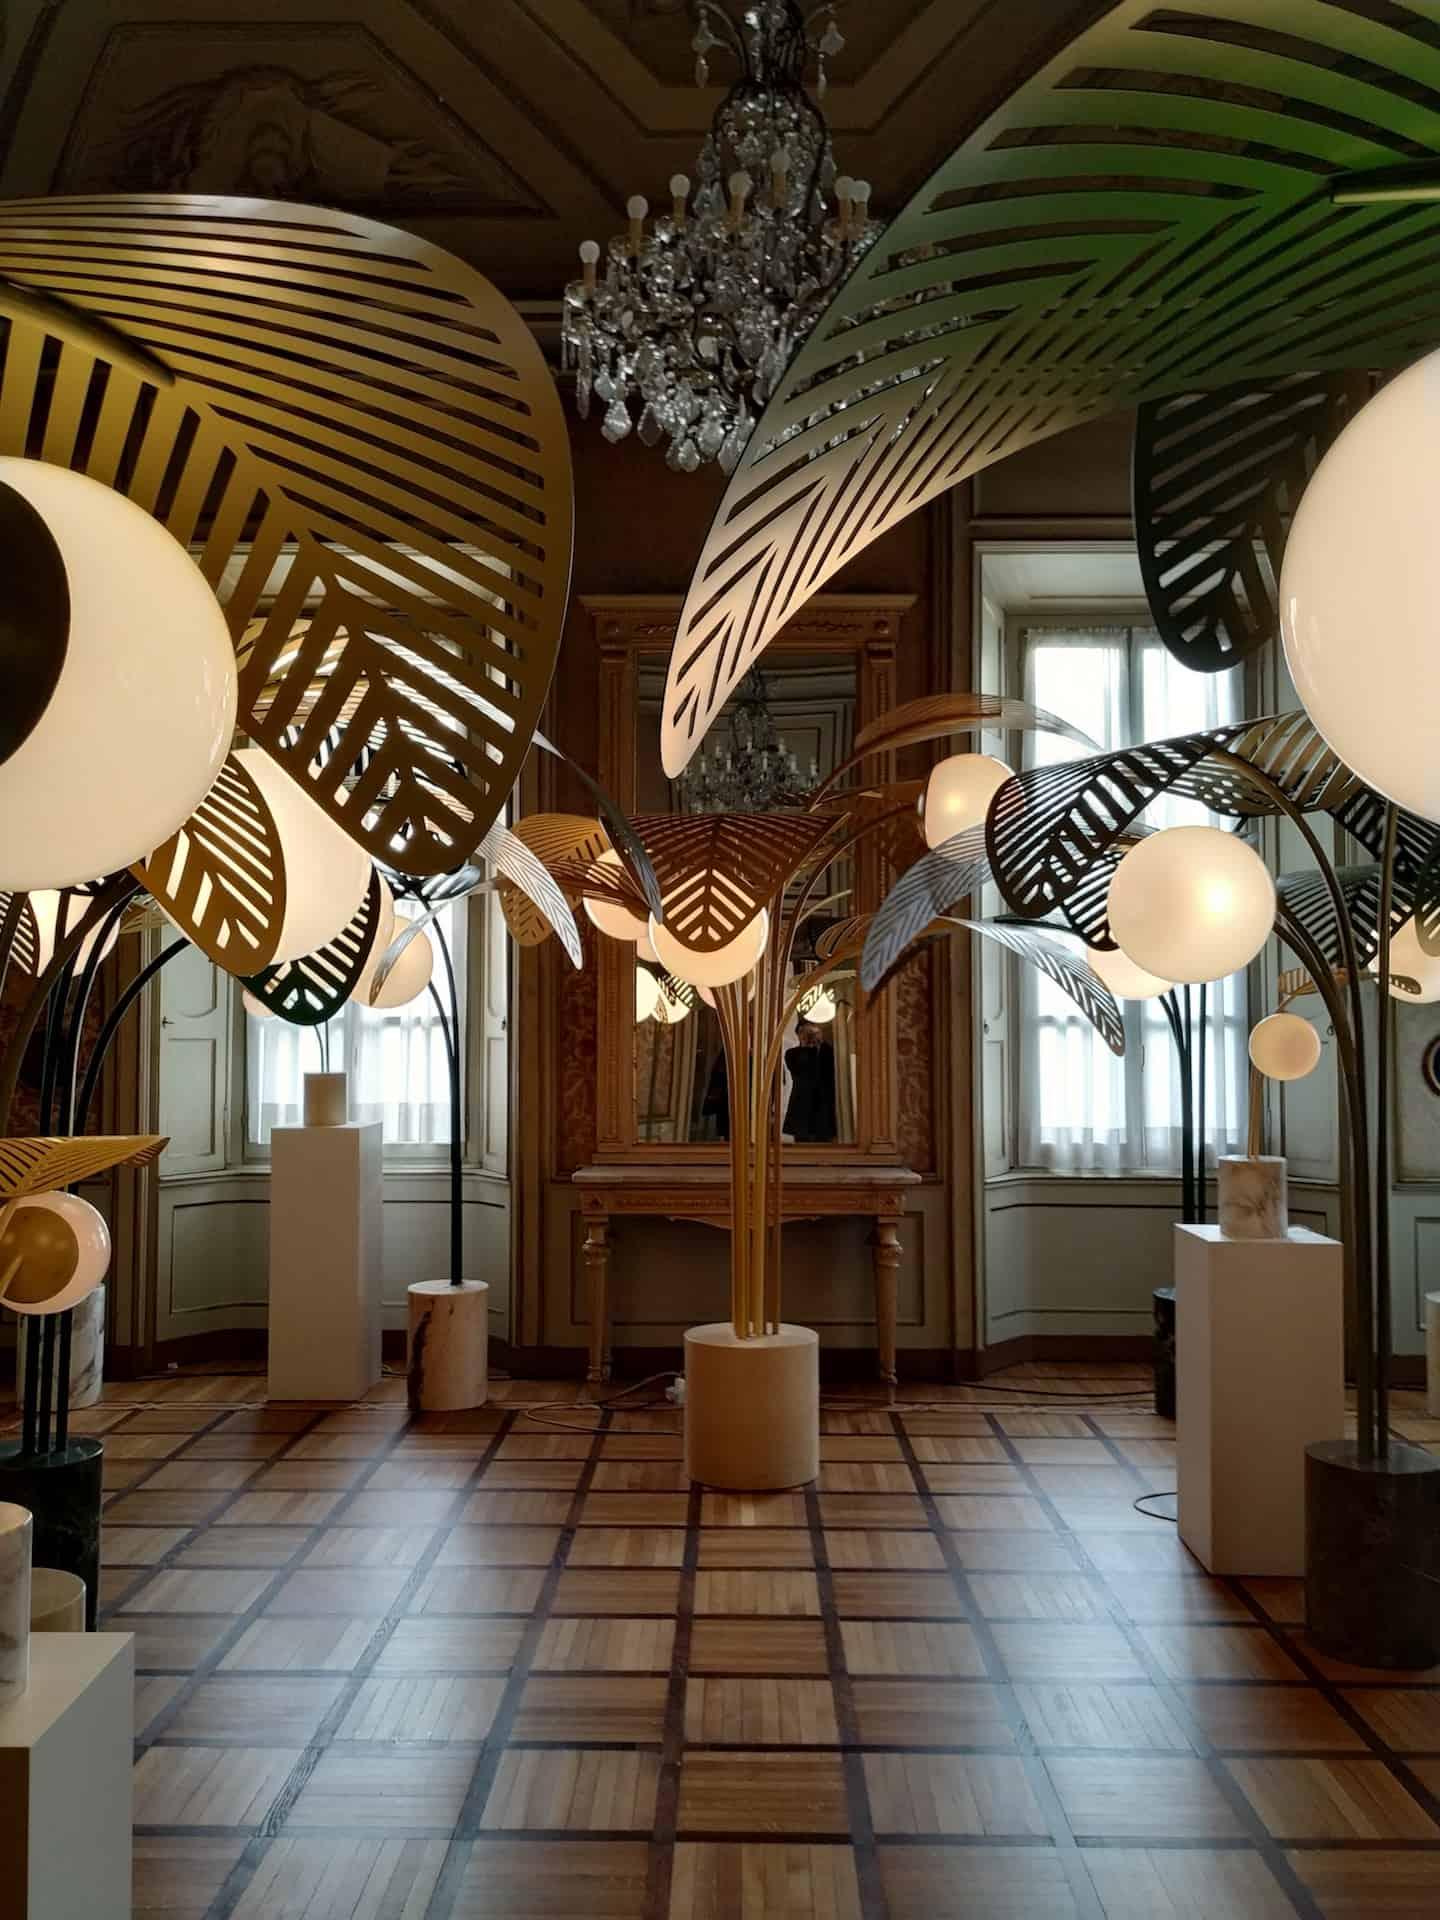 Salon Du Design Milan 2019 pirouette blog — a look around milan design week 2019 - mdw19